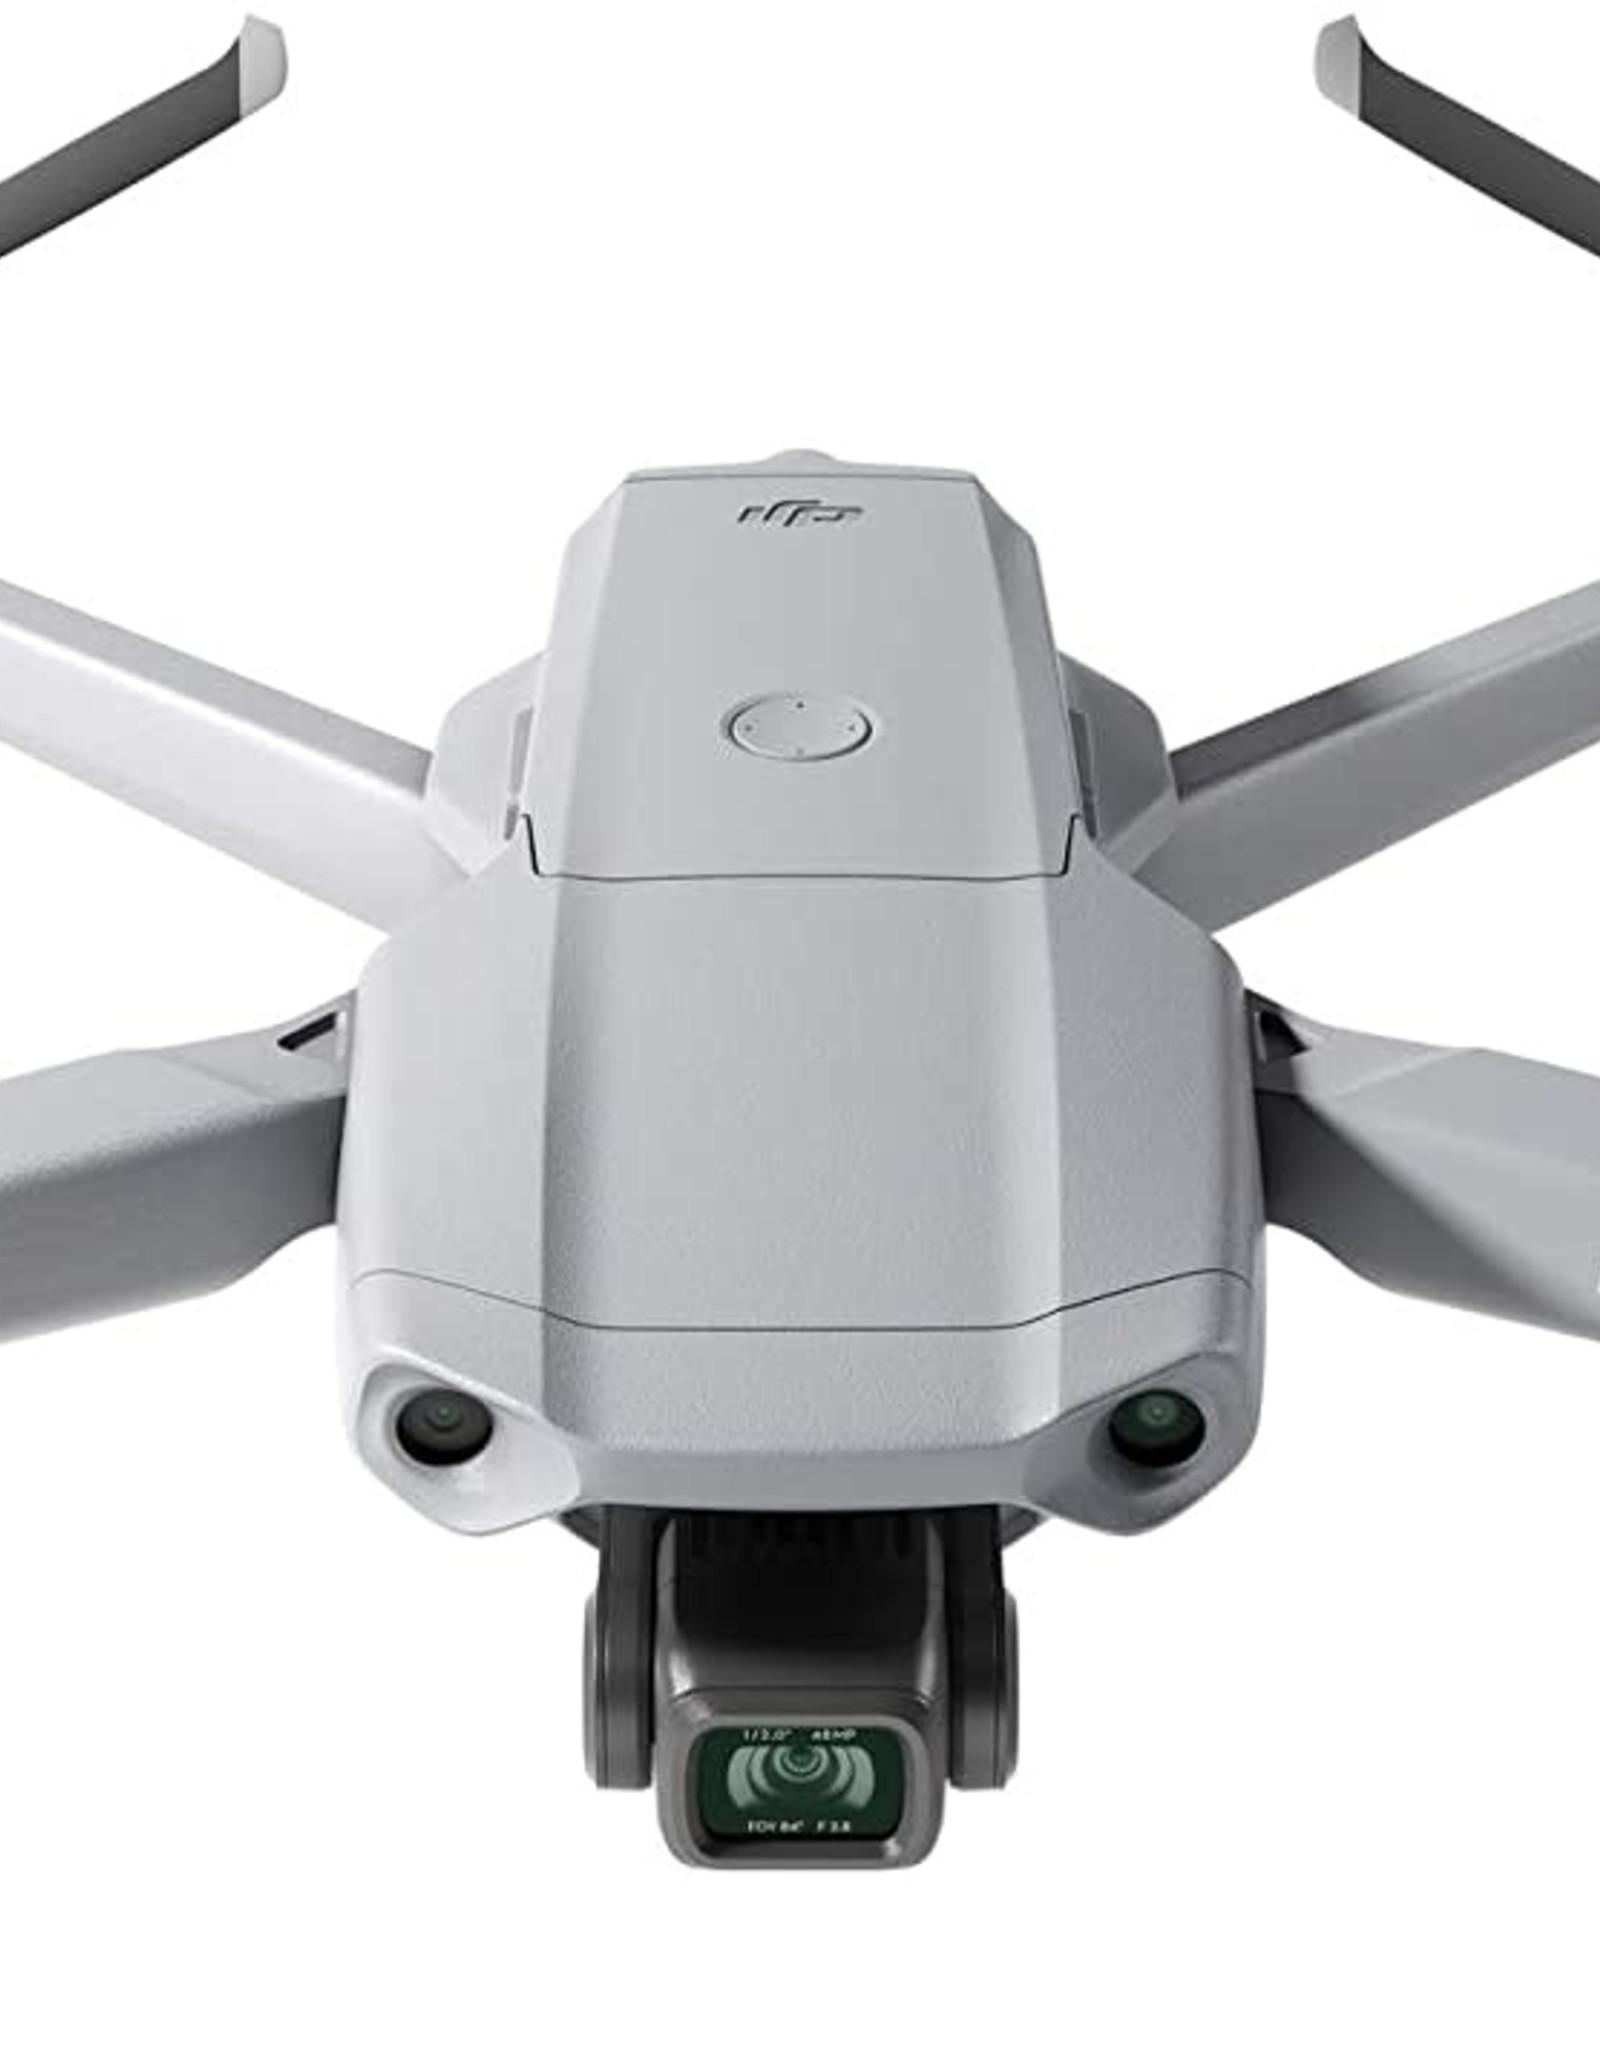 "Dji DJI Mavic Air 2 (Stand Alone) - Drone Quadcopter UAV with 48MP Camera 4K Video 8K Hyperlapse 1/2"" CMOS Sensor 3-Axis Gimbal 34min Flight Time ActiveTrack 3.0 Ocusync 2.0, Gray"